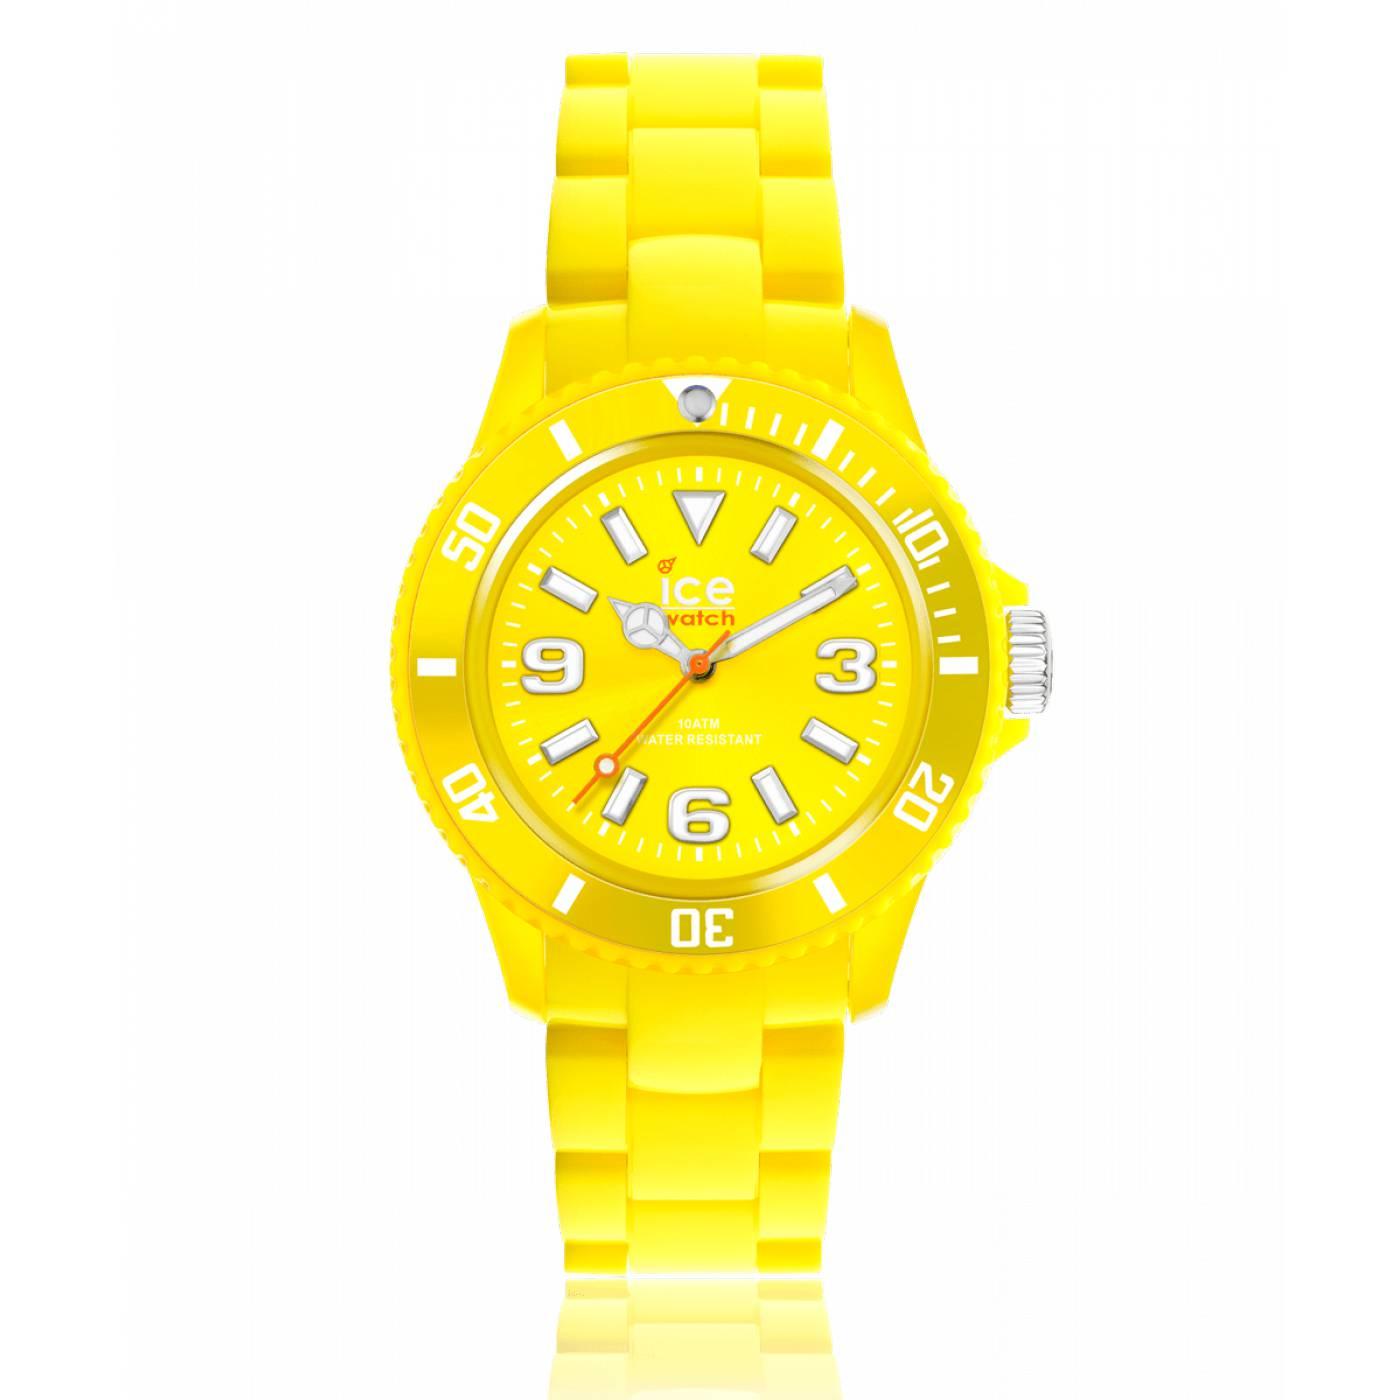 montre homme femme ice solide plastique jaune ice watch. Black Bedroom Furniture Sets. Home Design Ideas